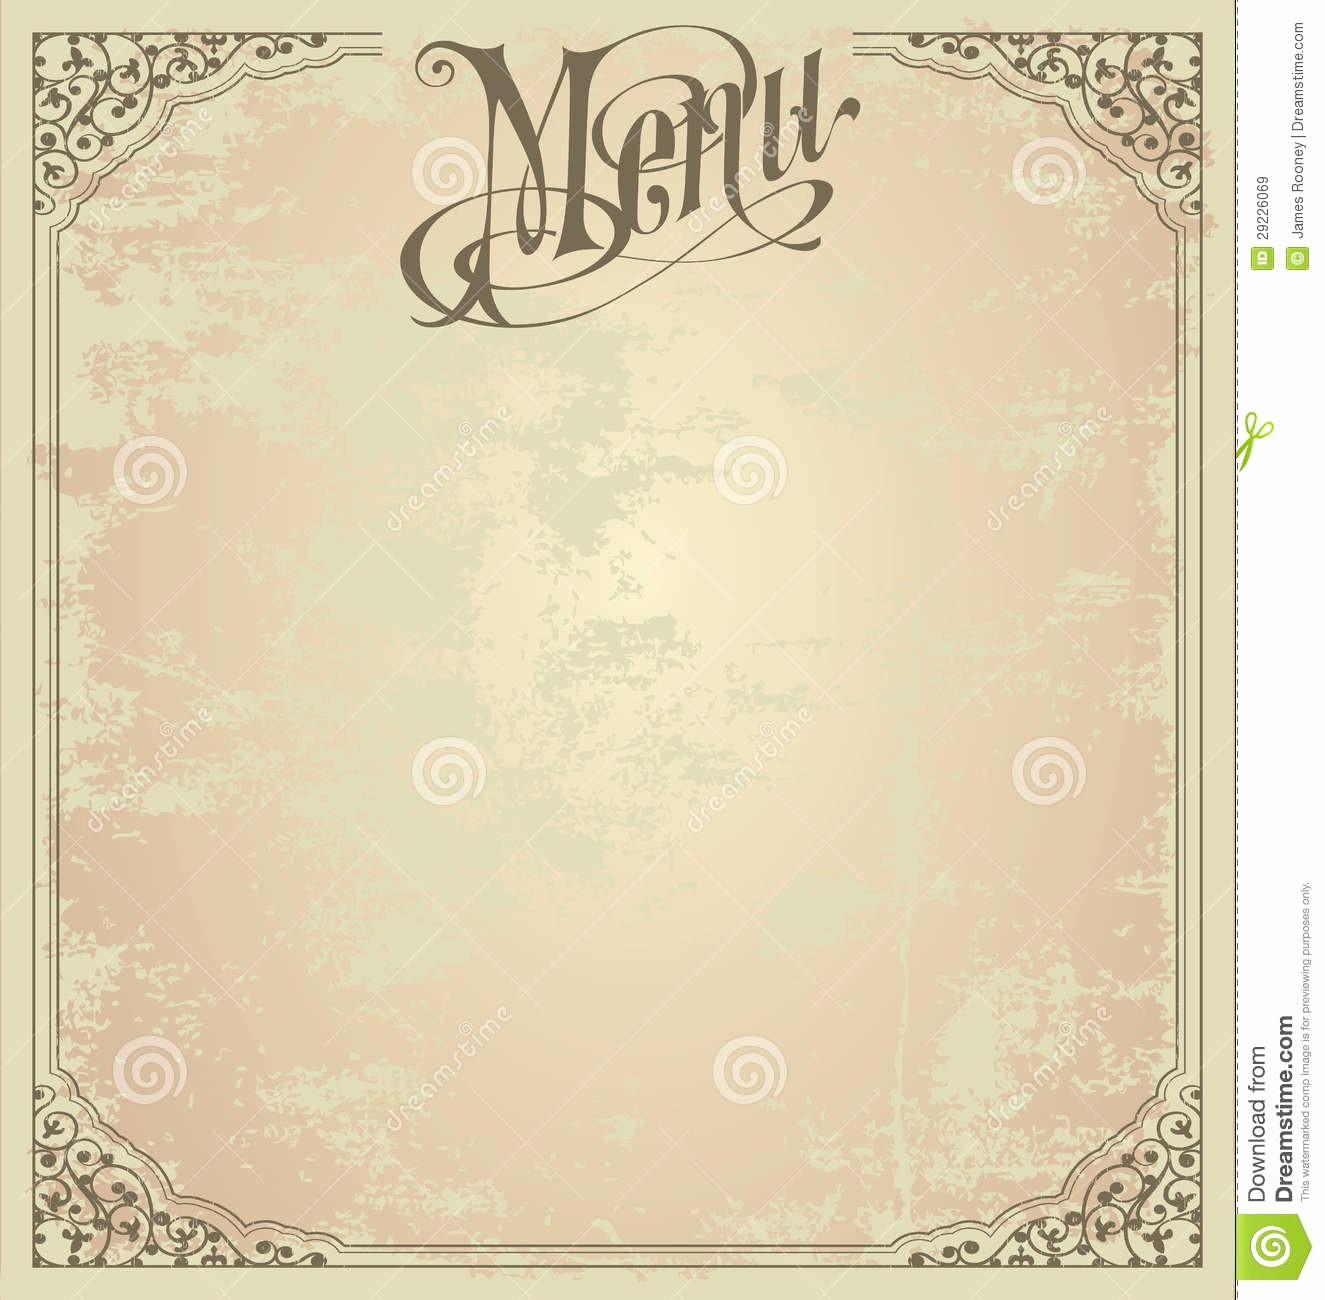 Menu Card Template Free Download Awesome Blank Menu Design Templates